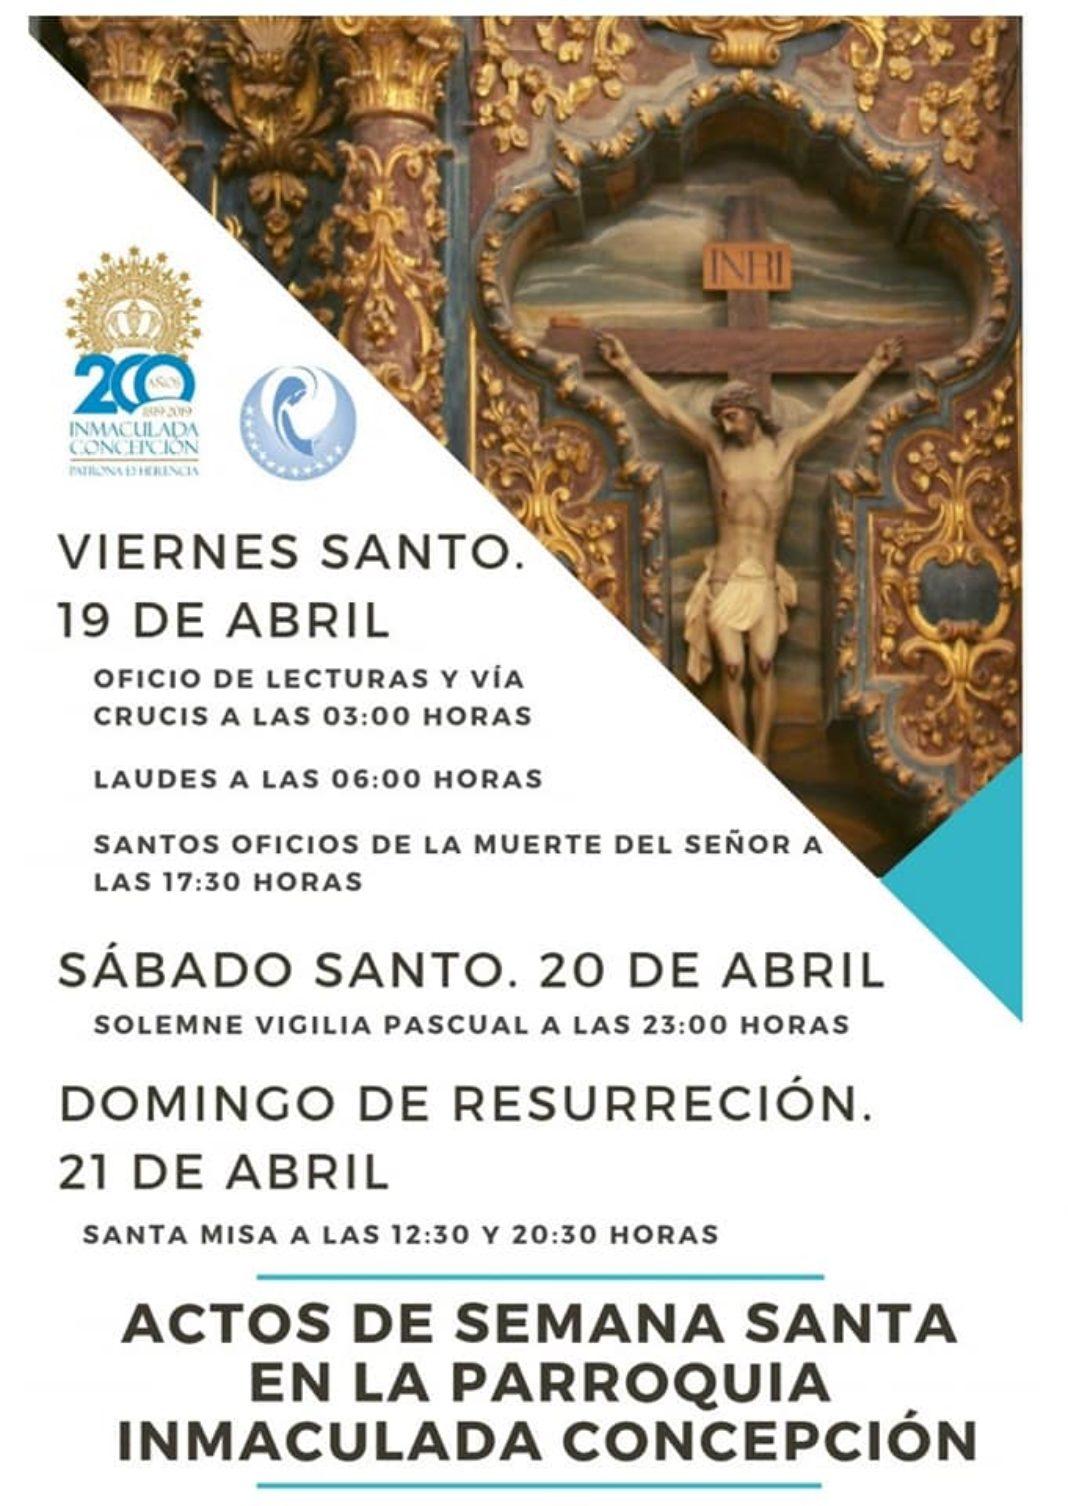 Celebraciones de Semana Santa en la iglesia parroquial de la Inmaculada 4